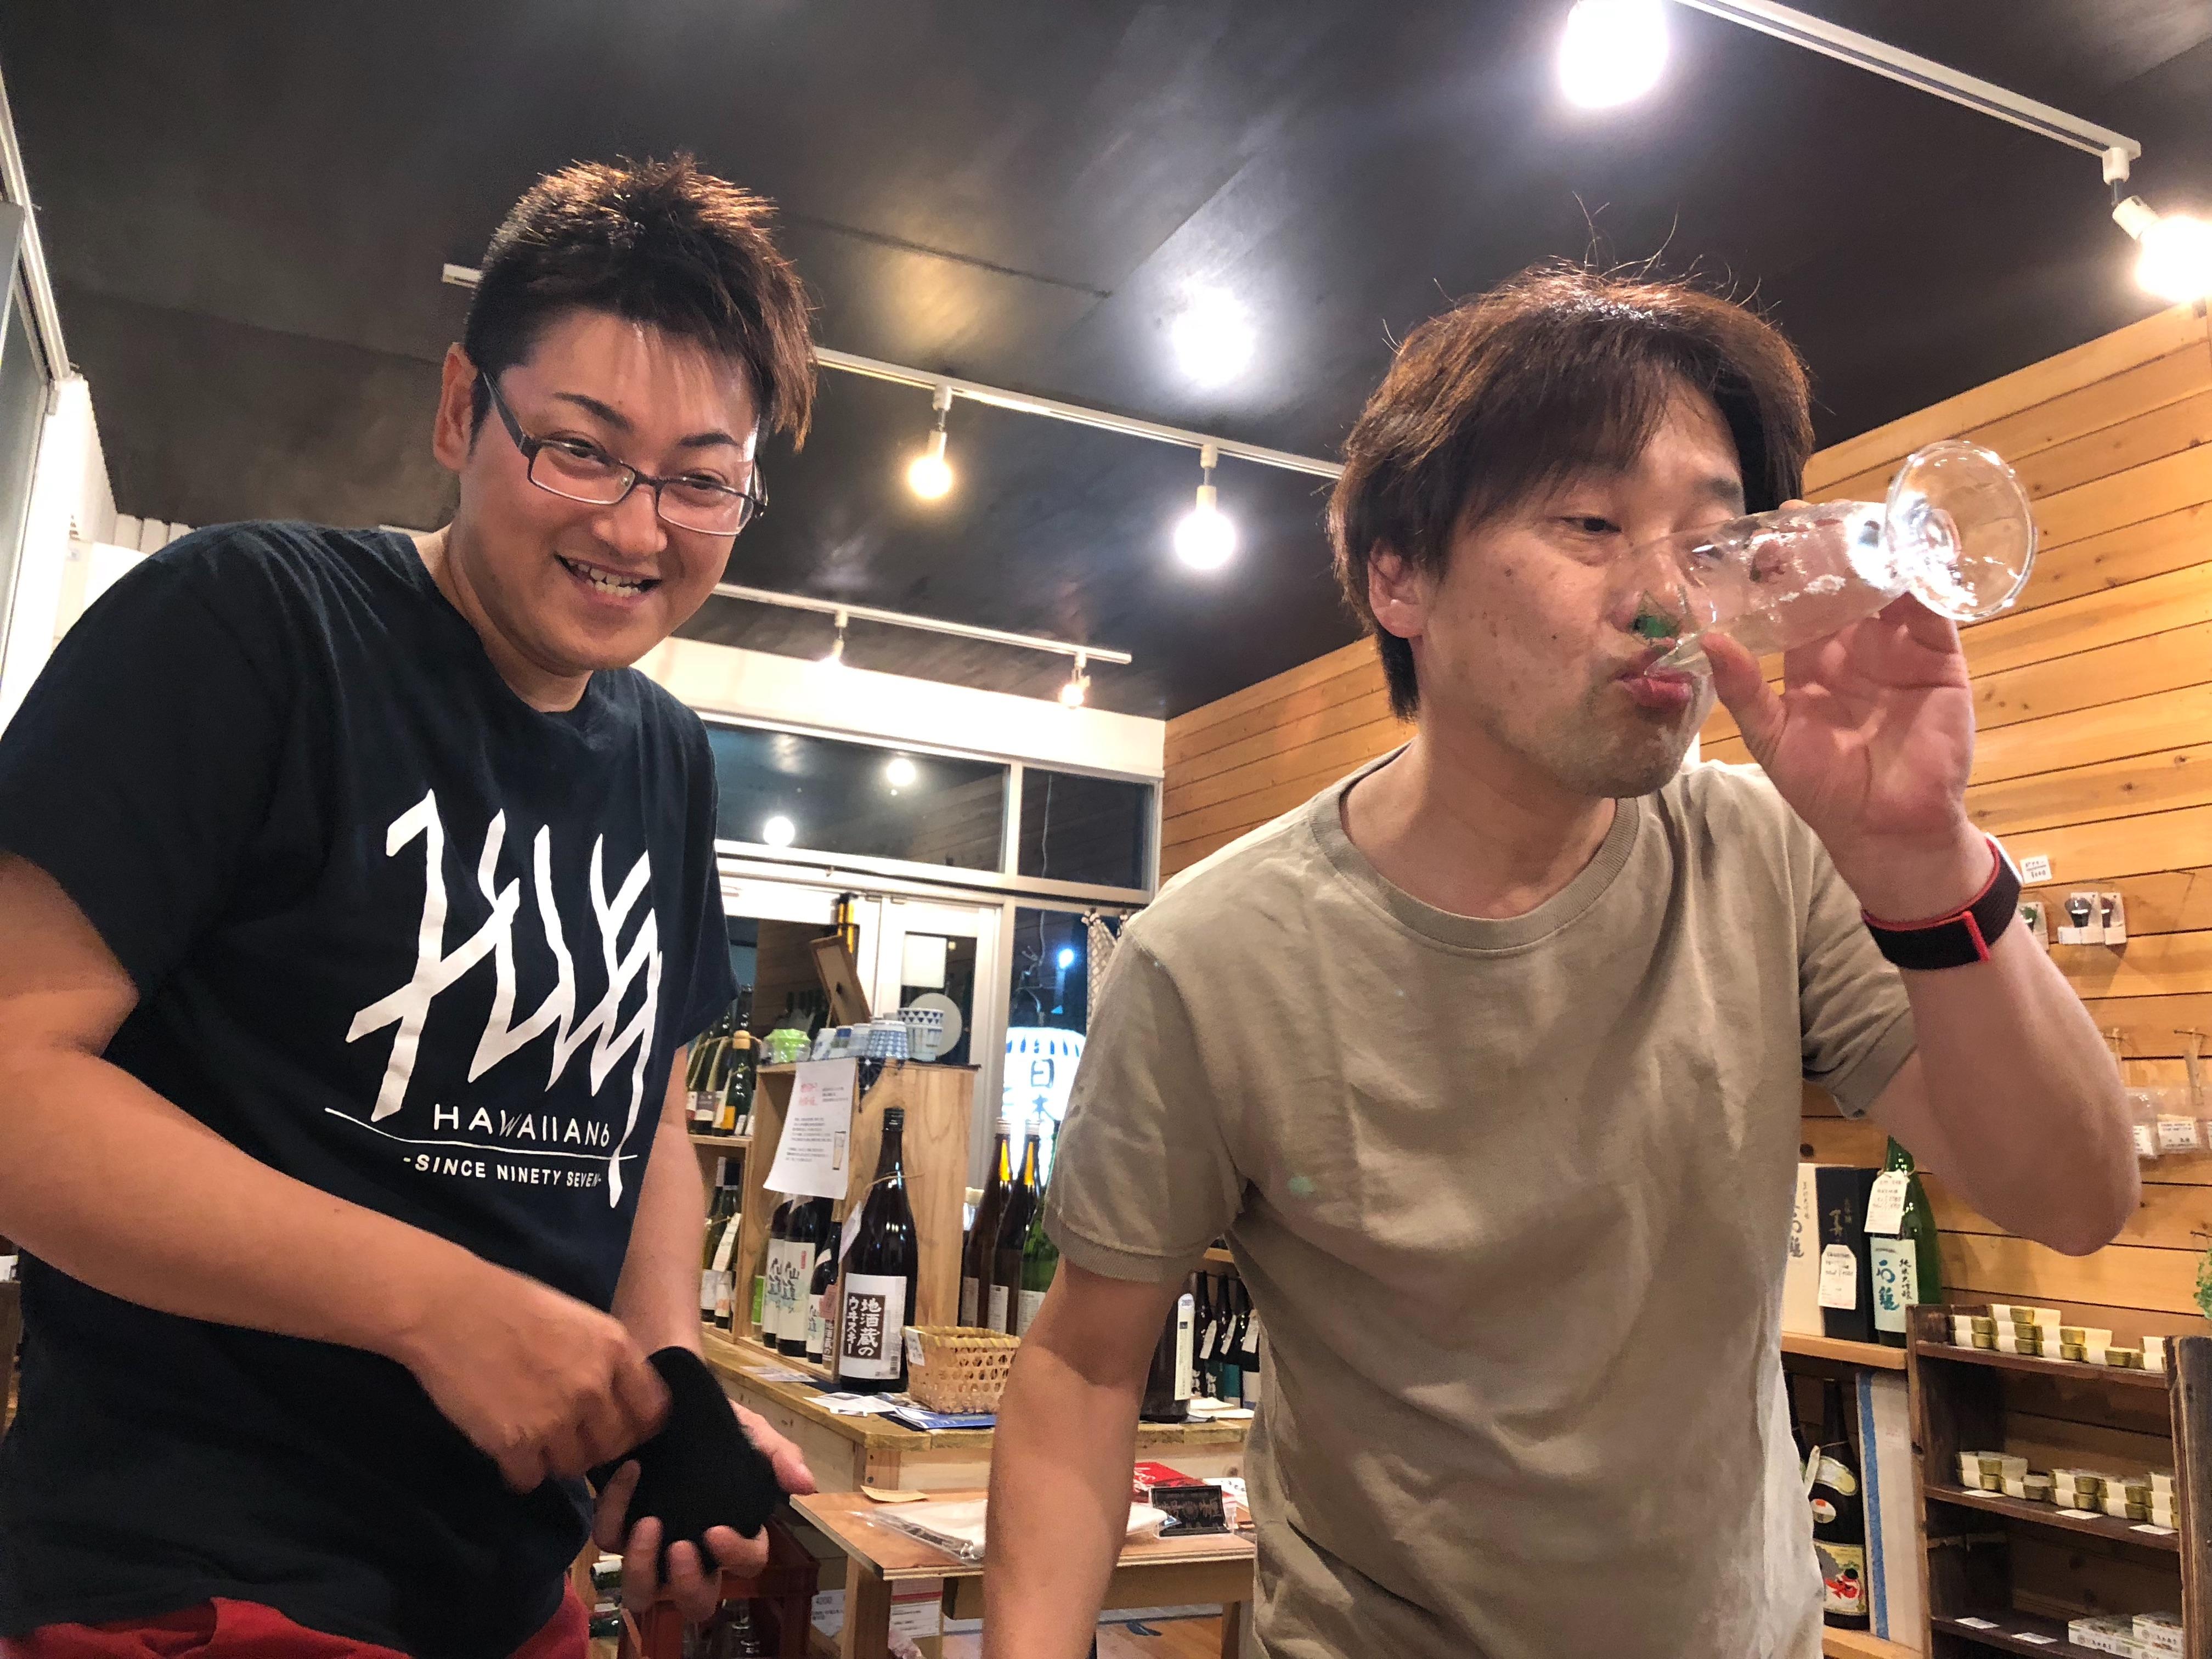 f:id:masanori-kato1972:20190323213331j:image